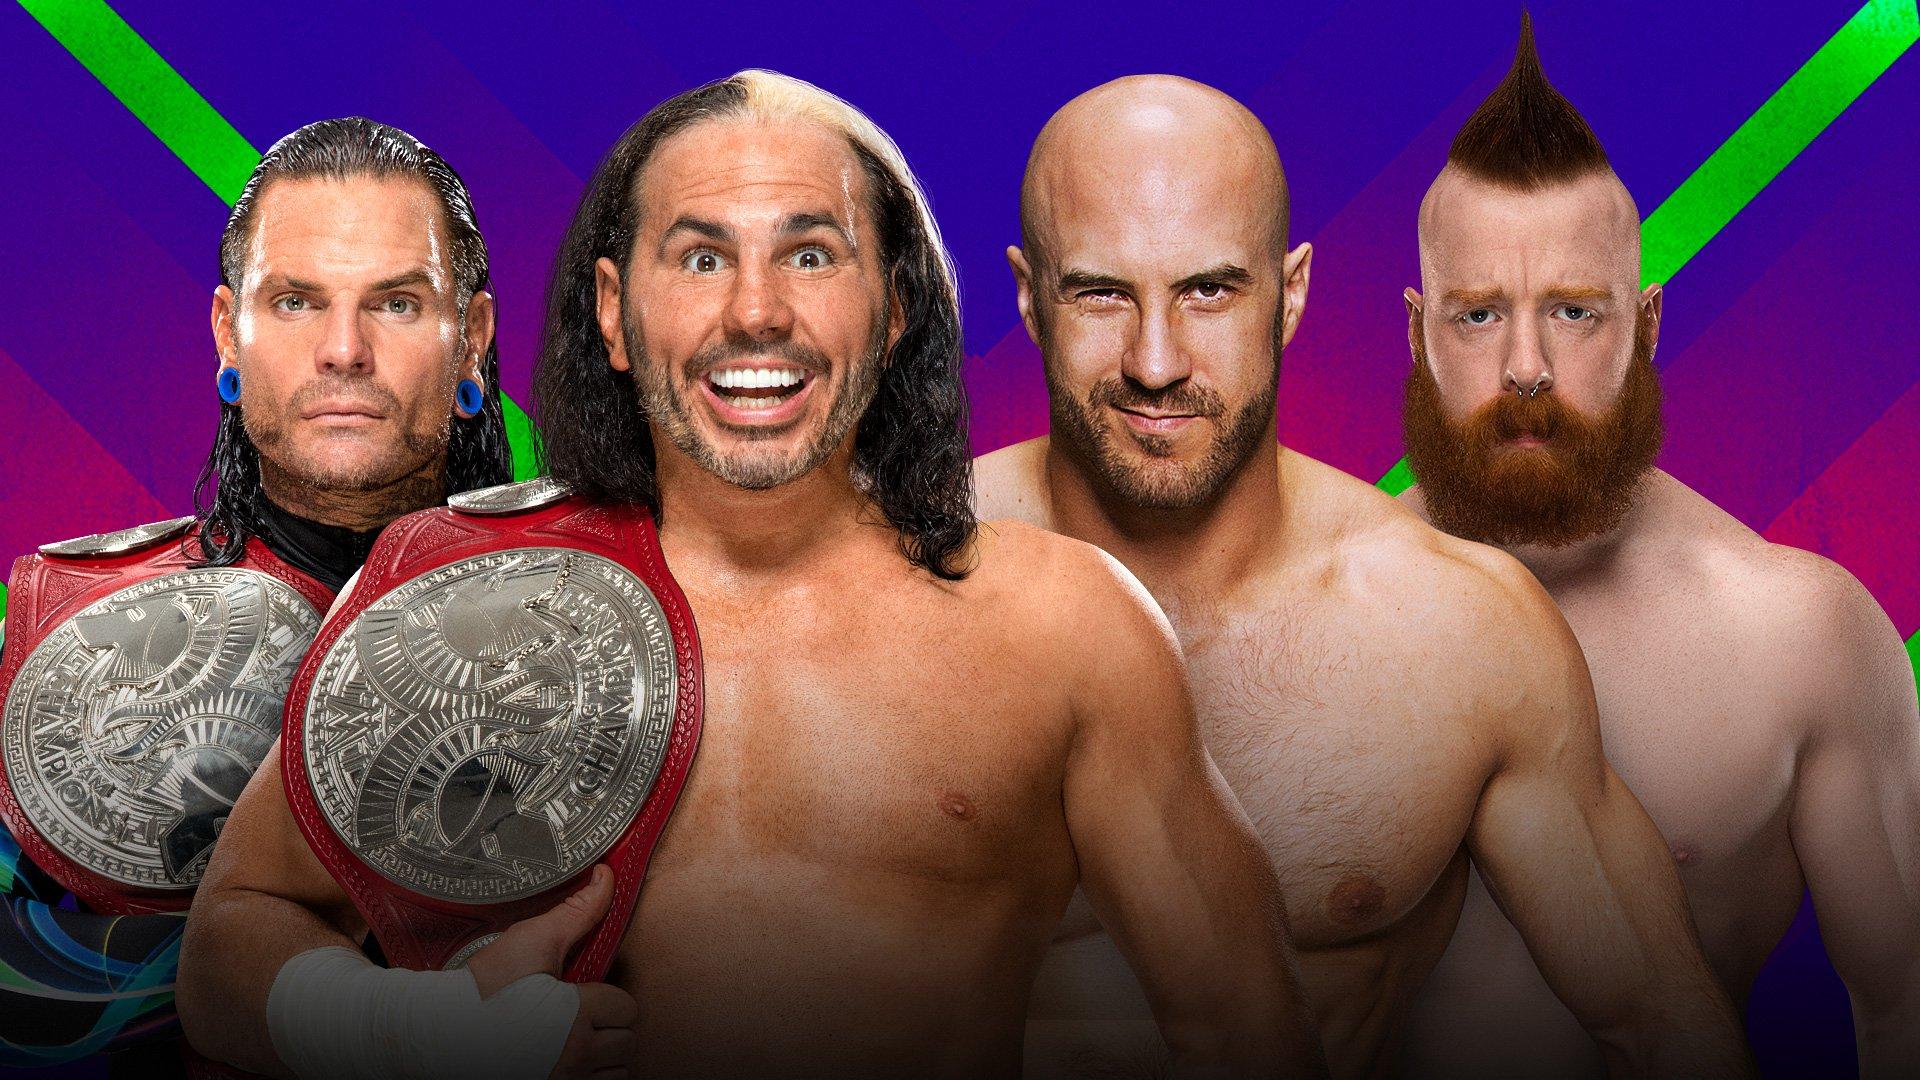 WWE Extreme Rules 2017: Hardy Boyz vs. Cesaro & Sheamus